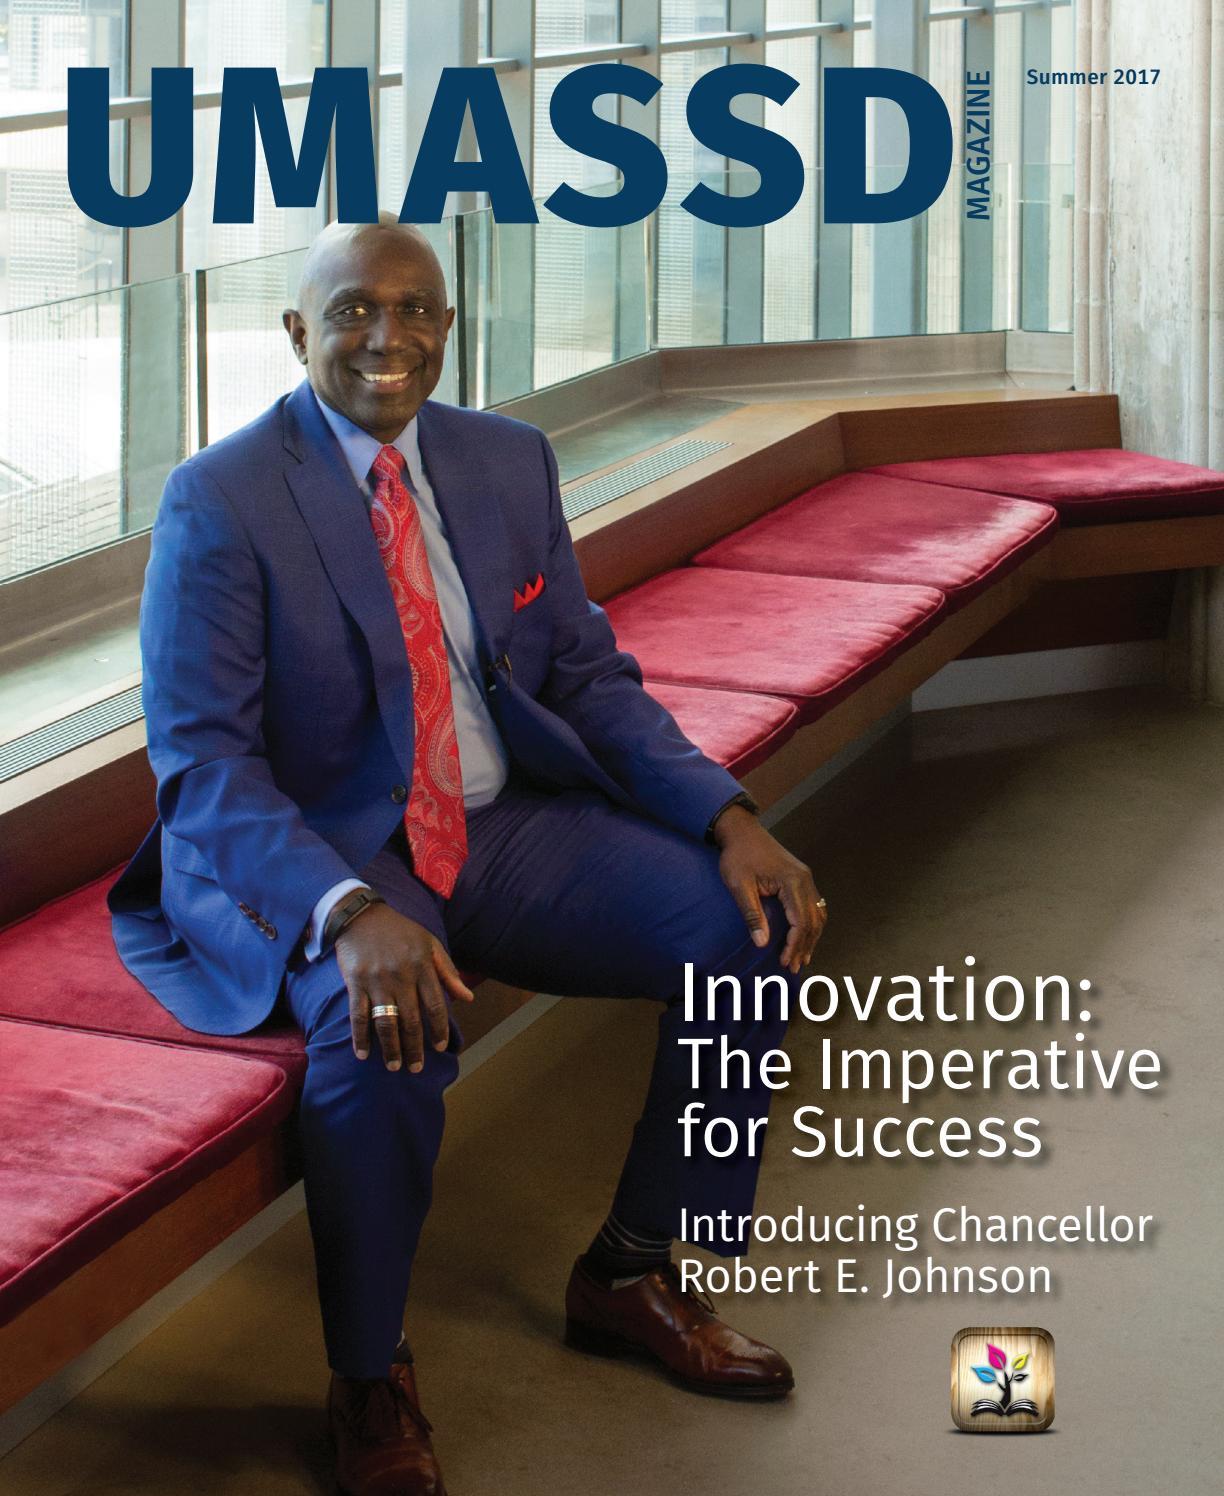 d6cce825b5 UMassD Magazine Summer 2017 by UMass Dartmouth - issuu